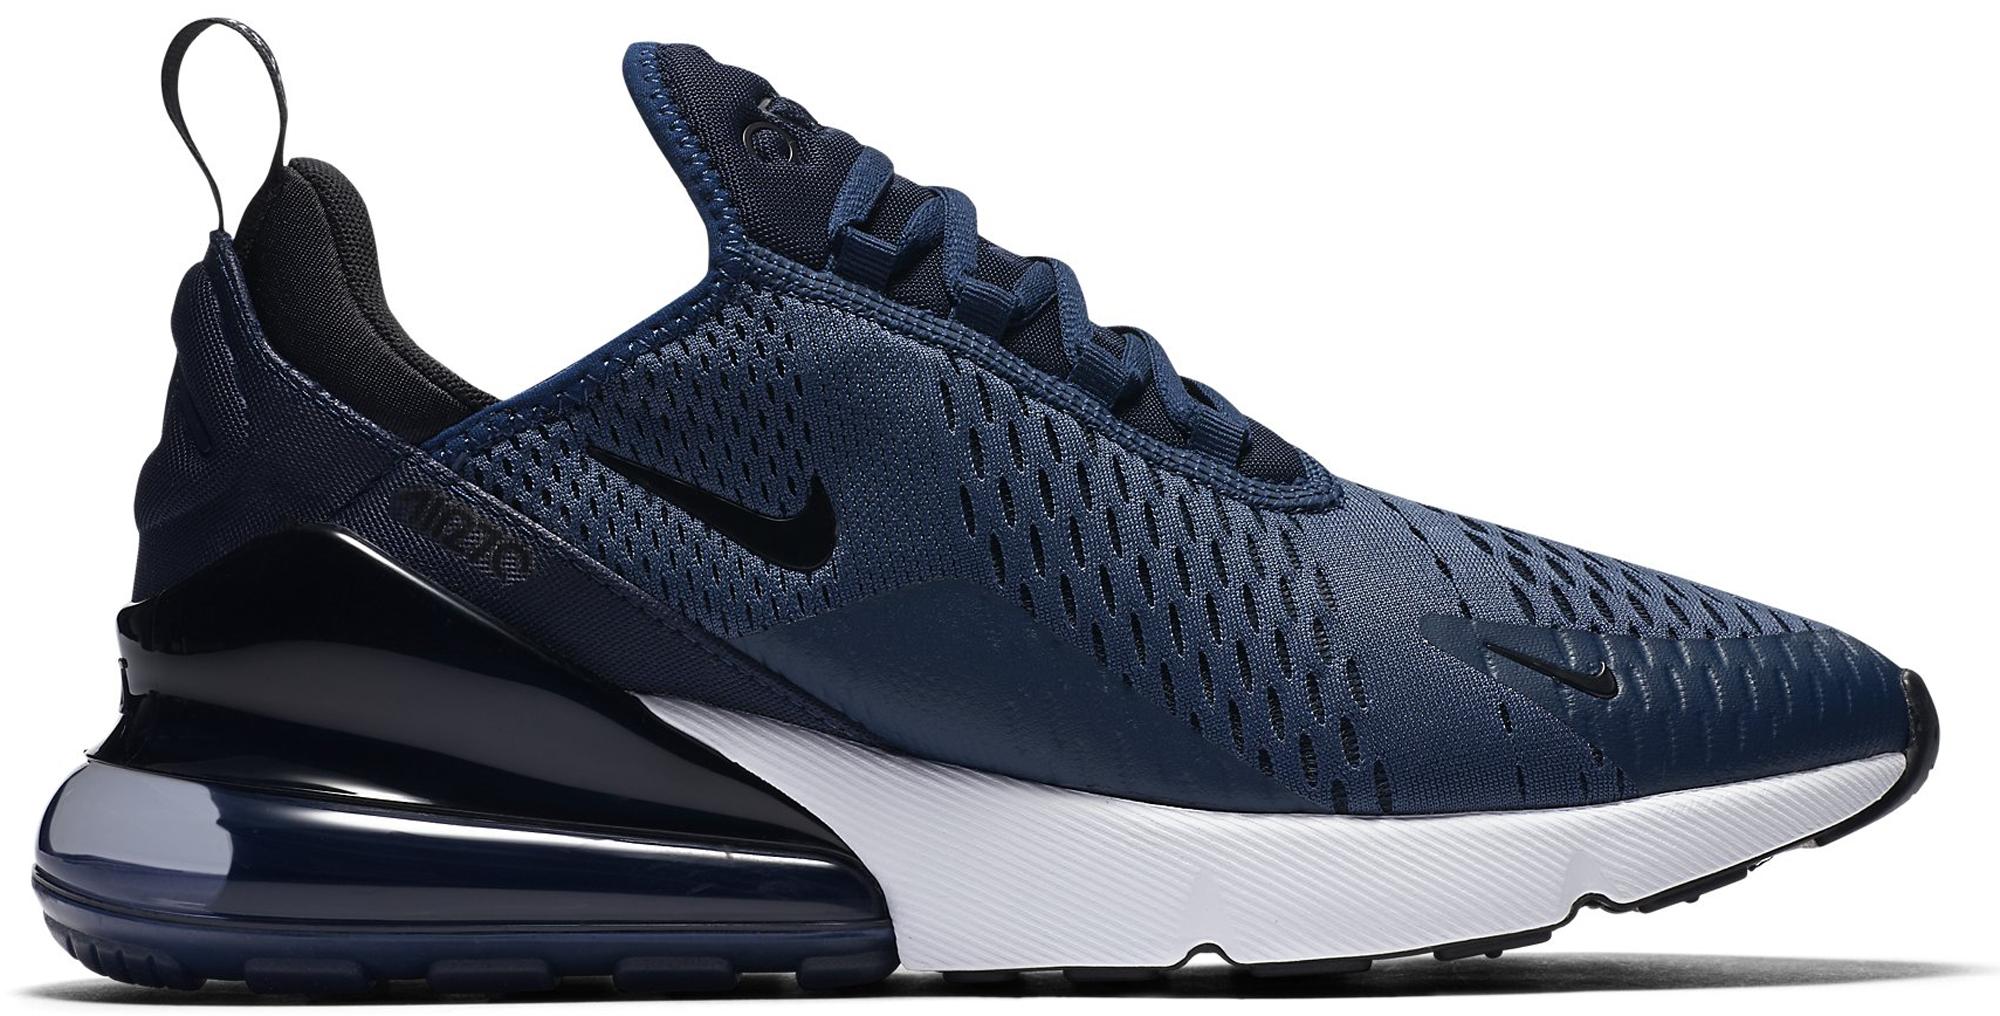 Nike Air Max 270 Midnight Navy 4c722f746204